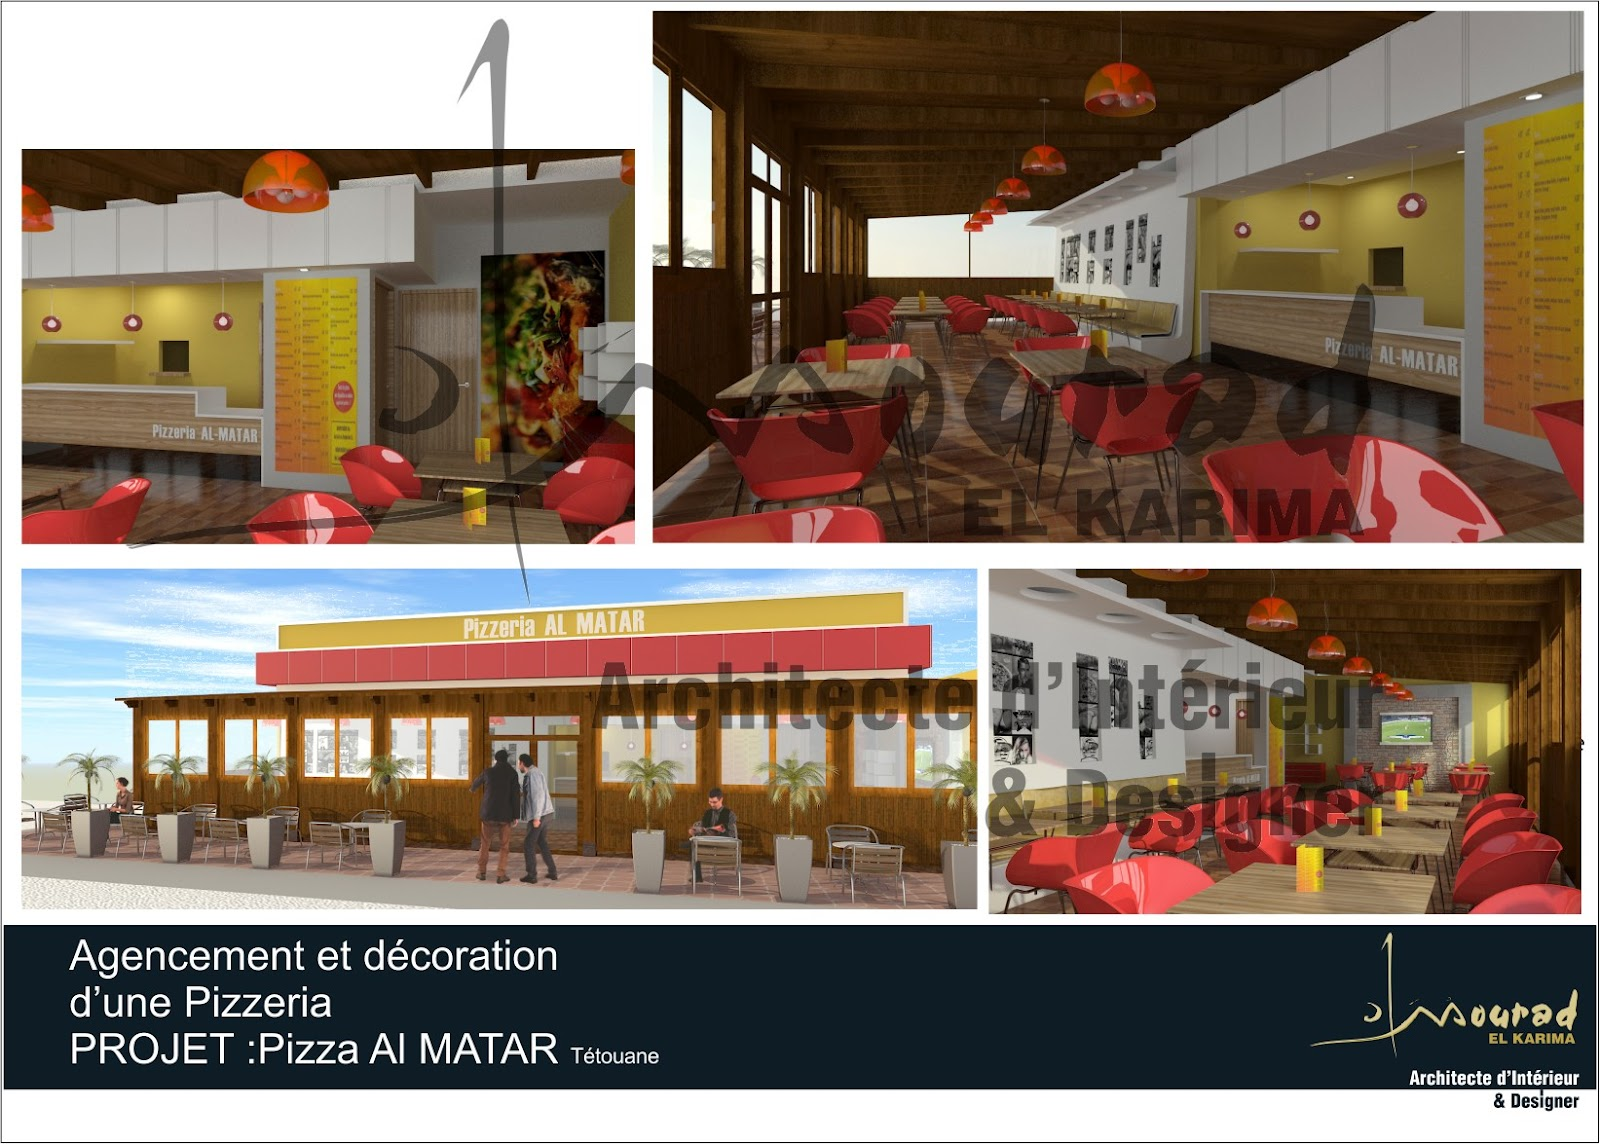 mourad el karima architecte d 39 interieur designer pizzeria al matar t touan. Black Bedroom Furniture Sets. Home Design Ideas